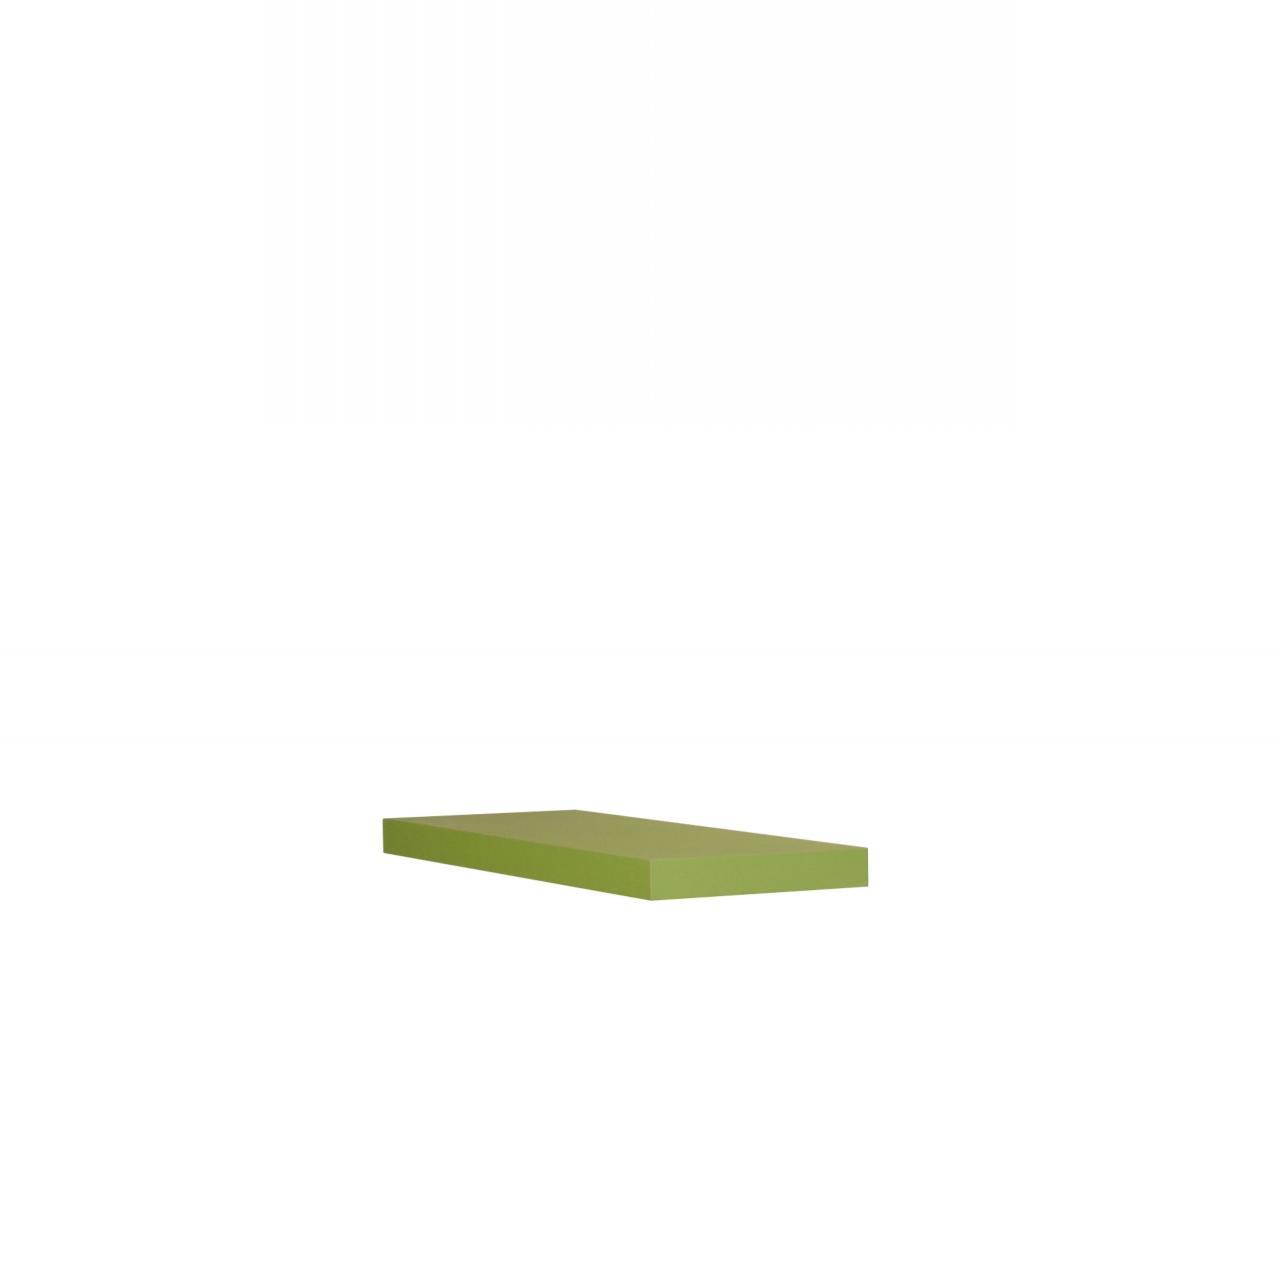 Steckboard 60 cm